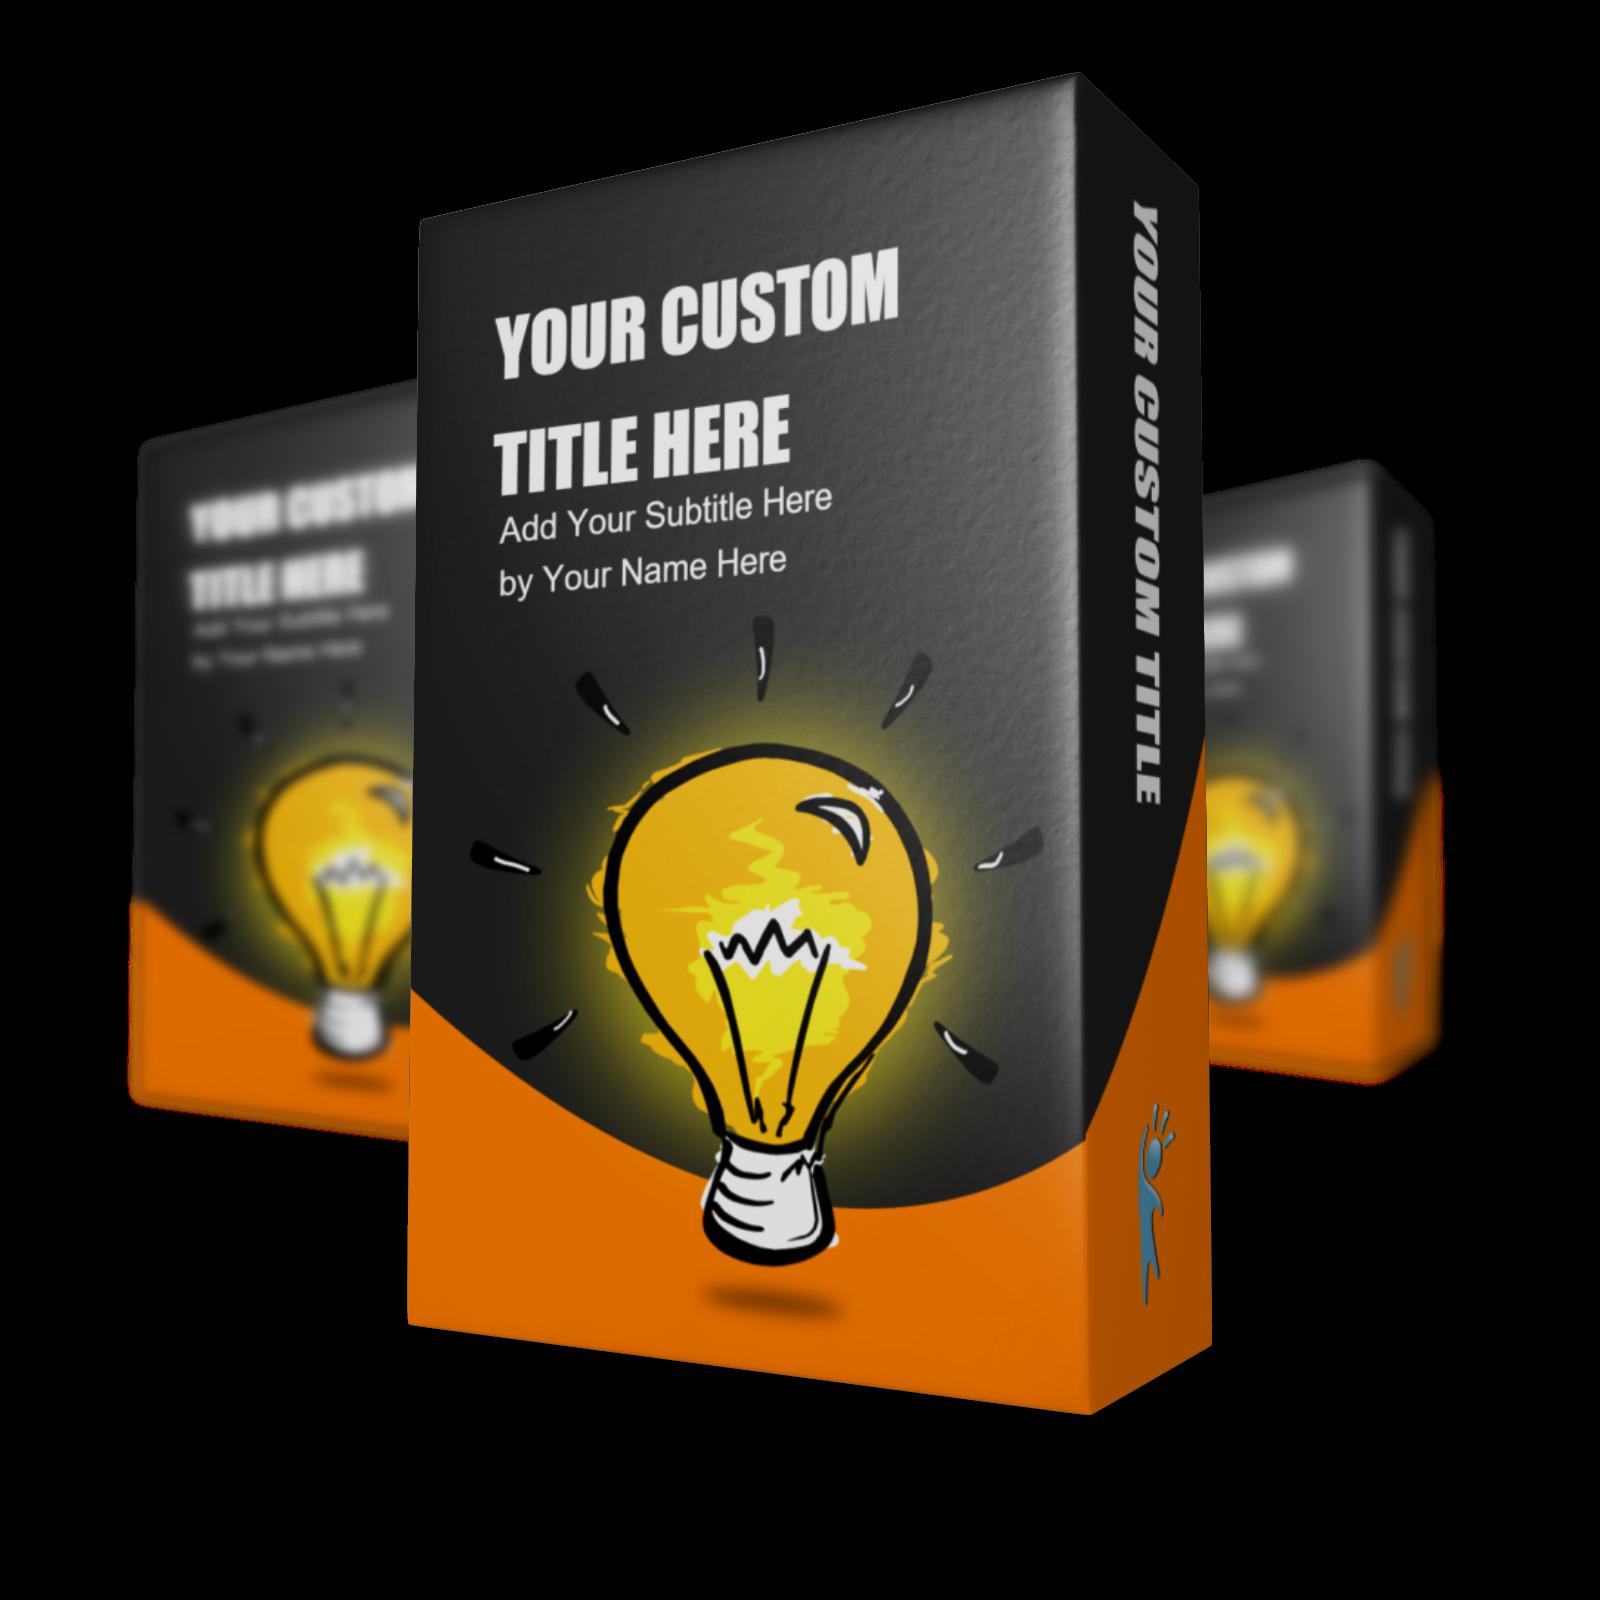 Custom Presentation Images